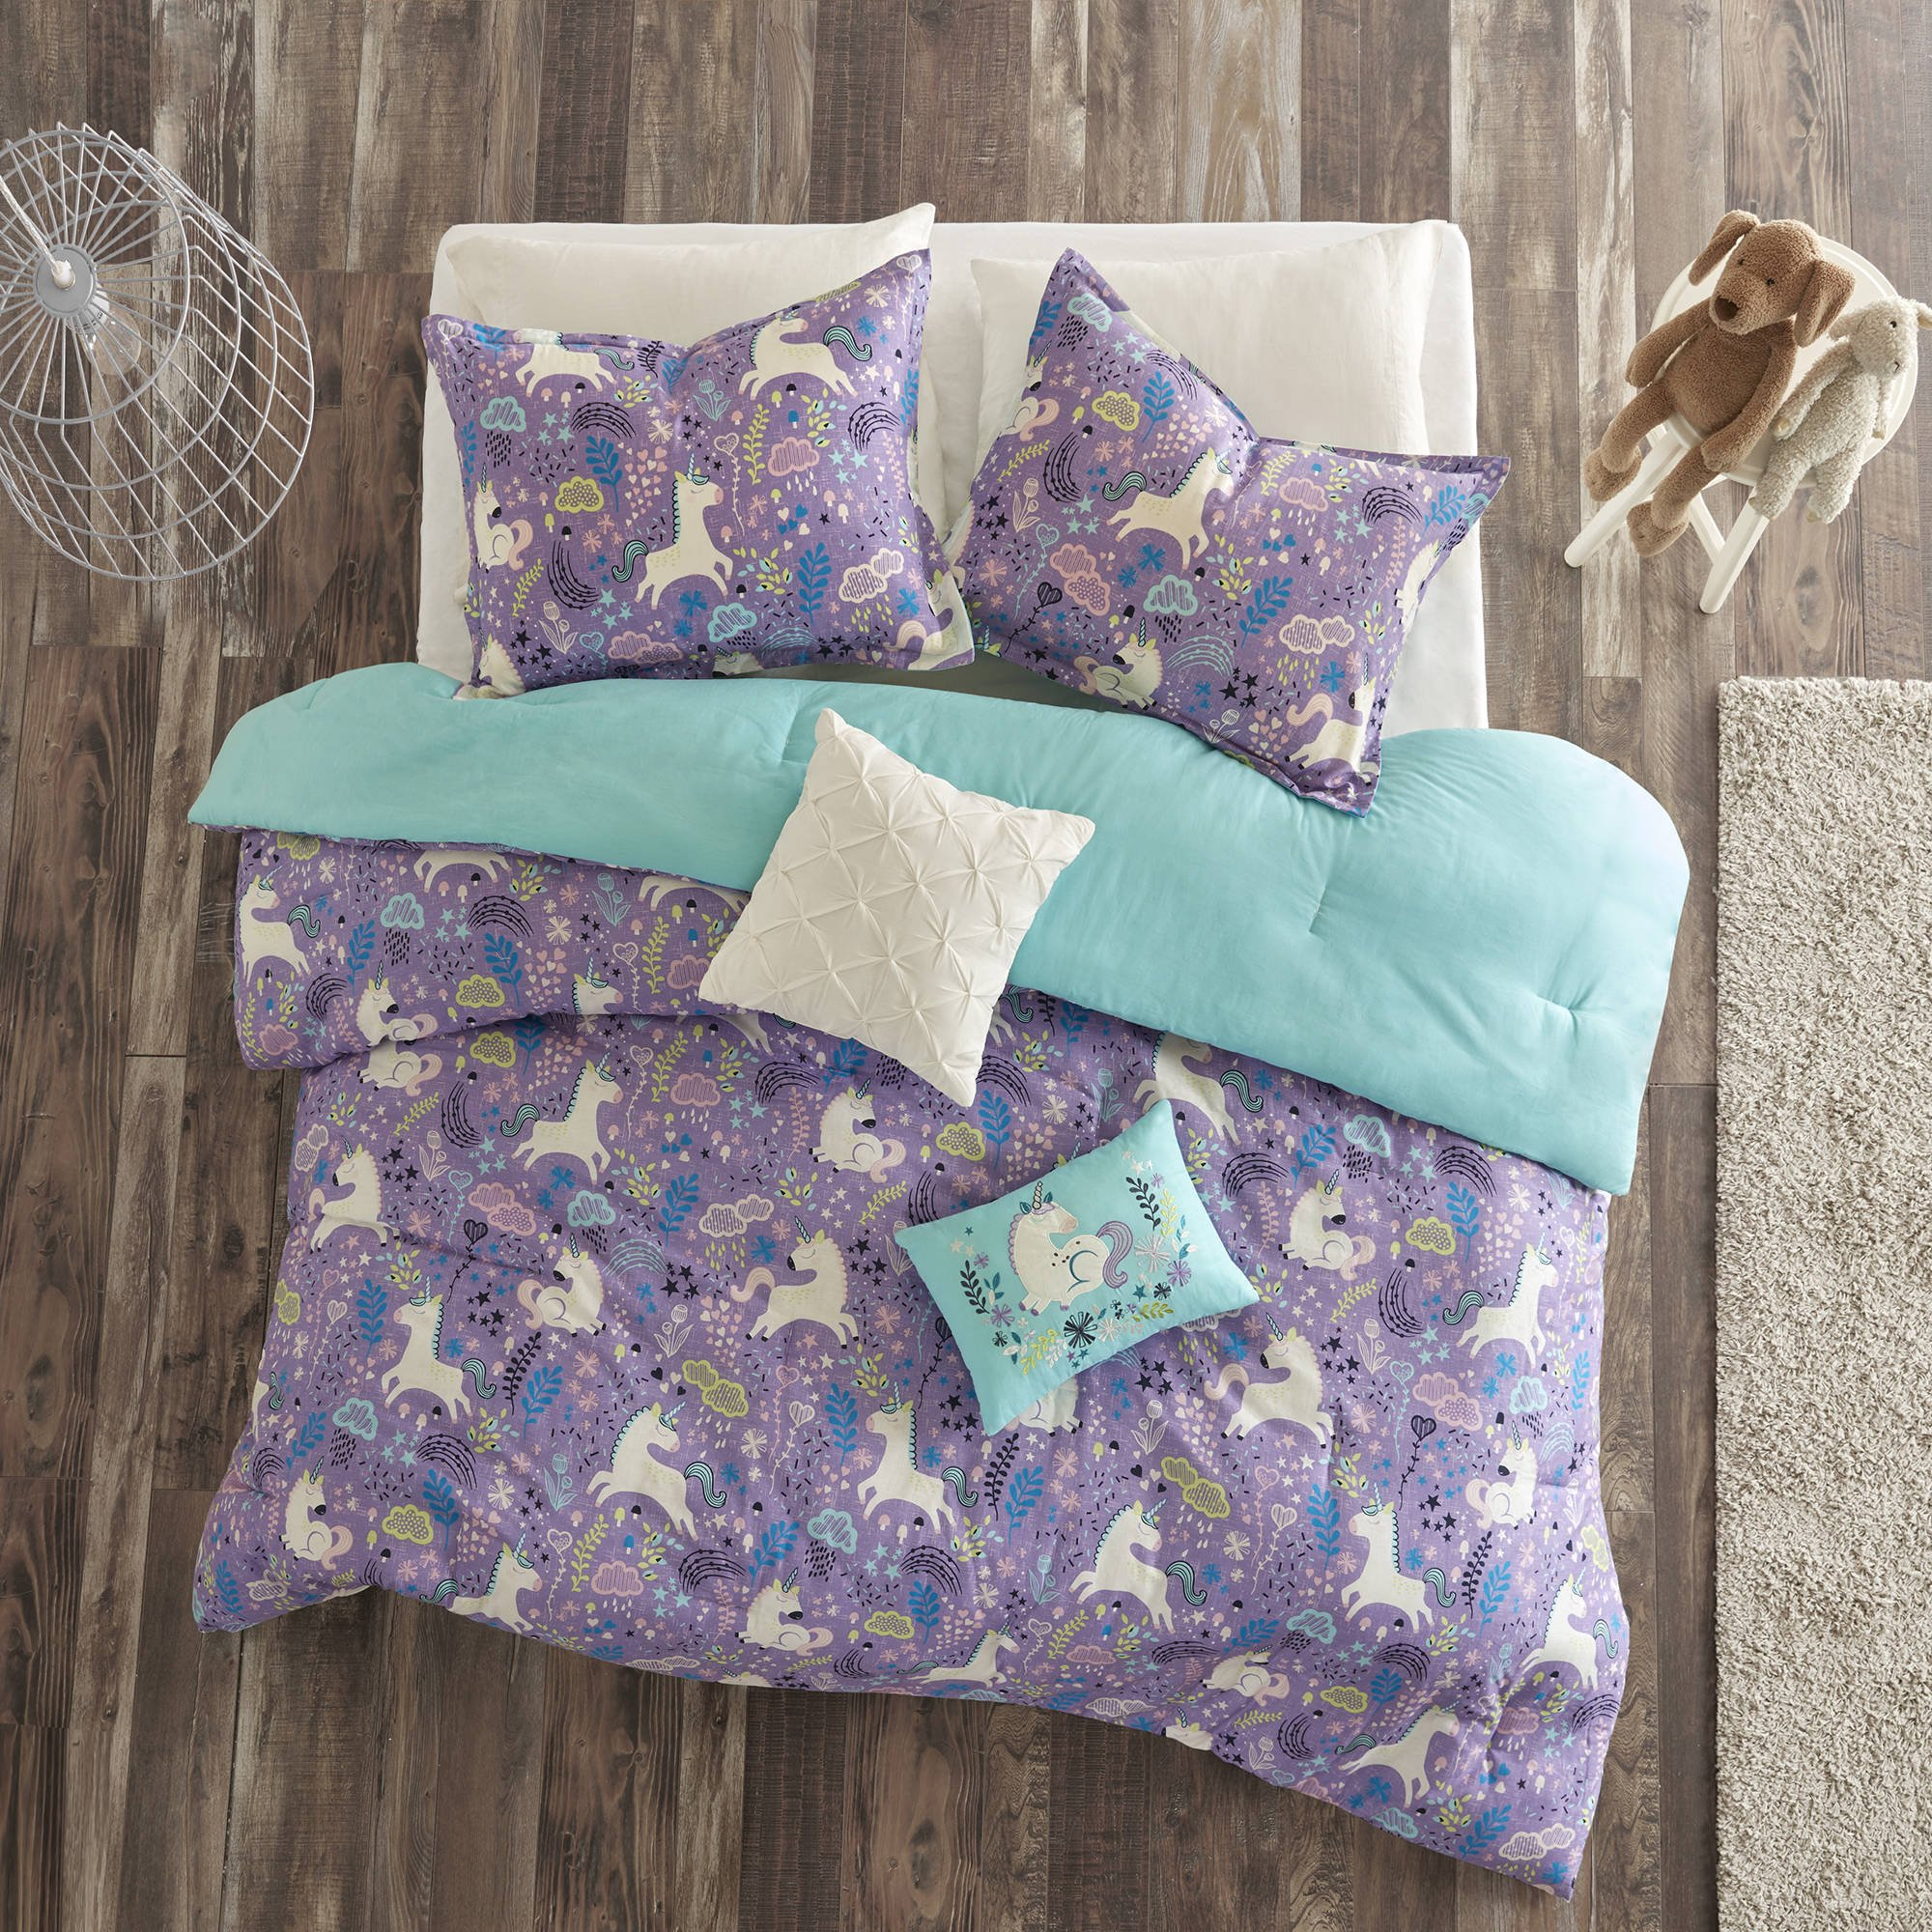 5 Piece Girls Light Purple Blue White Unicorn Dream Comforter Full Queen Set, Vibrant All Over Girly Magical Unicorns Theme Bedding, Bright Whimsical Multi Magic Creatures Themed Pattern, Cotton